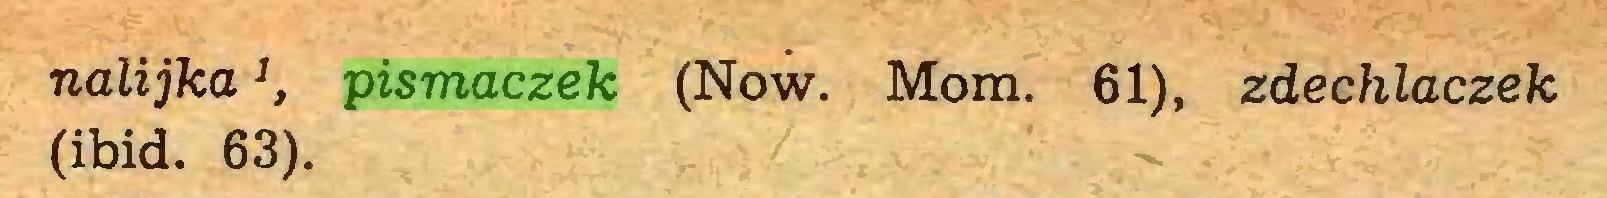 (...) nalijkaJ, pismaczek (Now. Mom. 61), zdechlaczek (ibid. 63)...